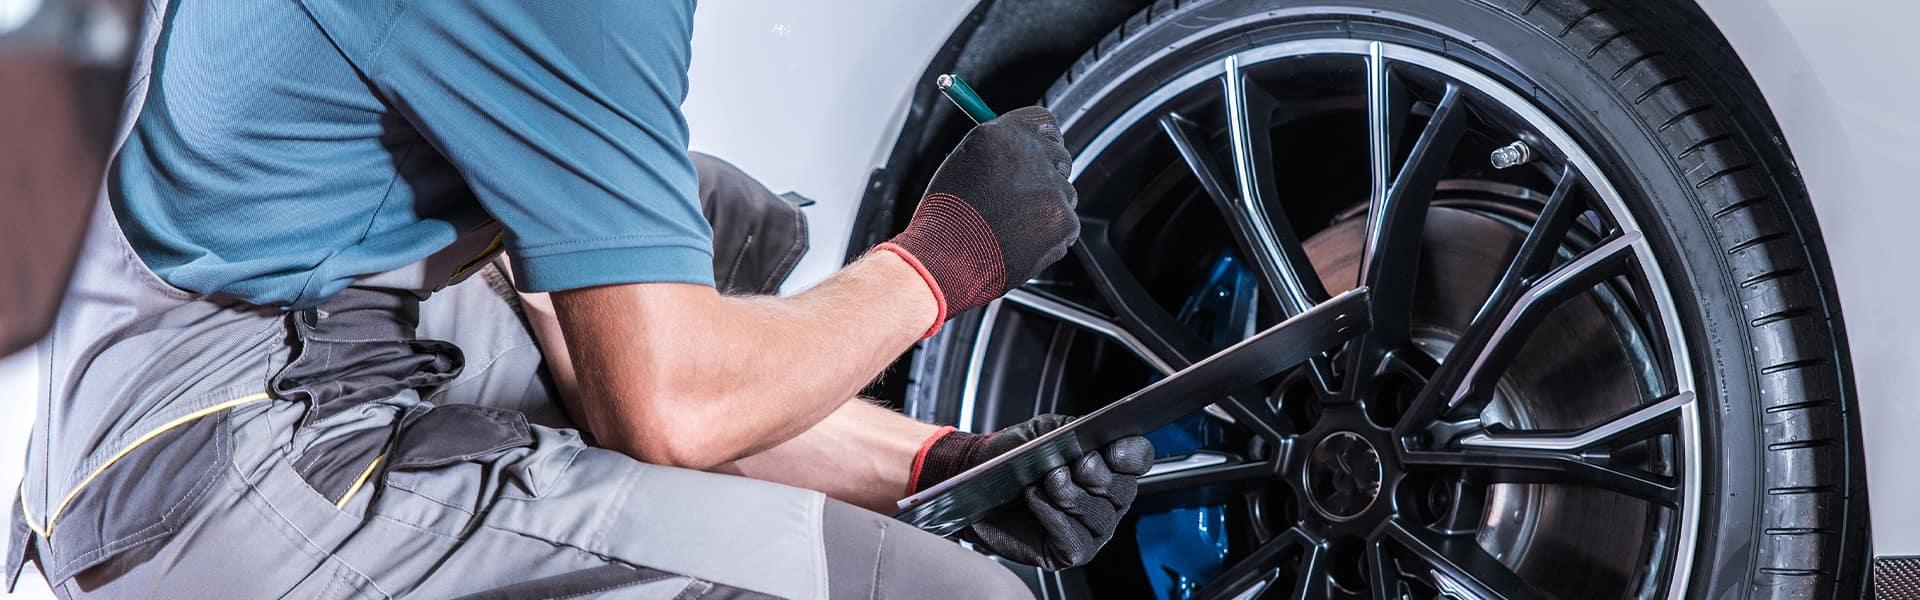 Boch Hyundai is a Hyundai Dealer Near Canton MA | Service Advisor Working on Tire